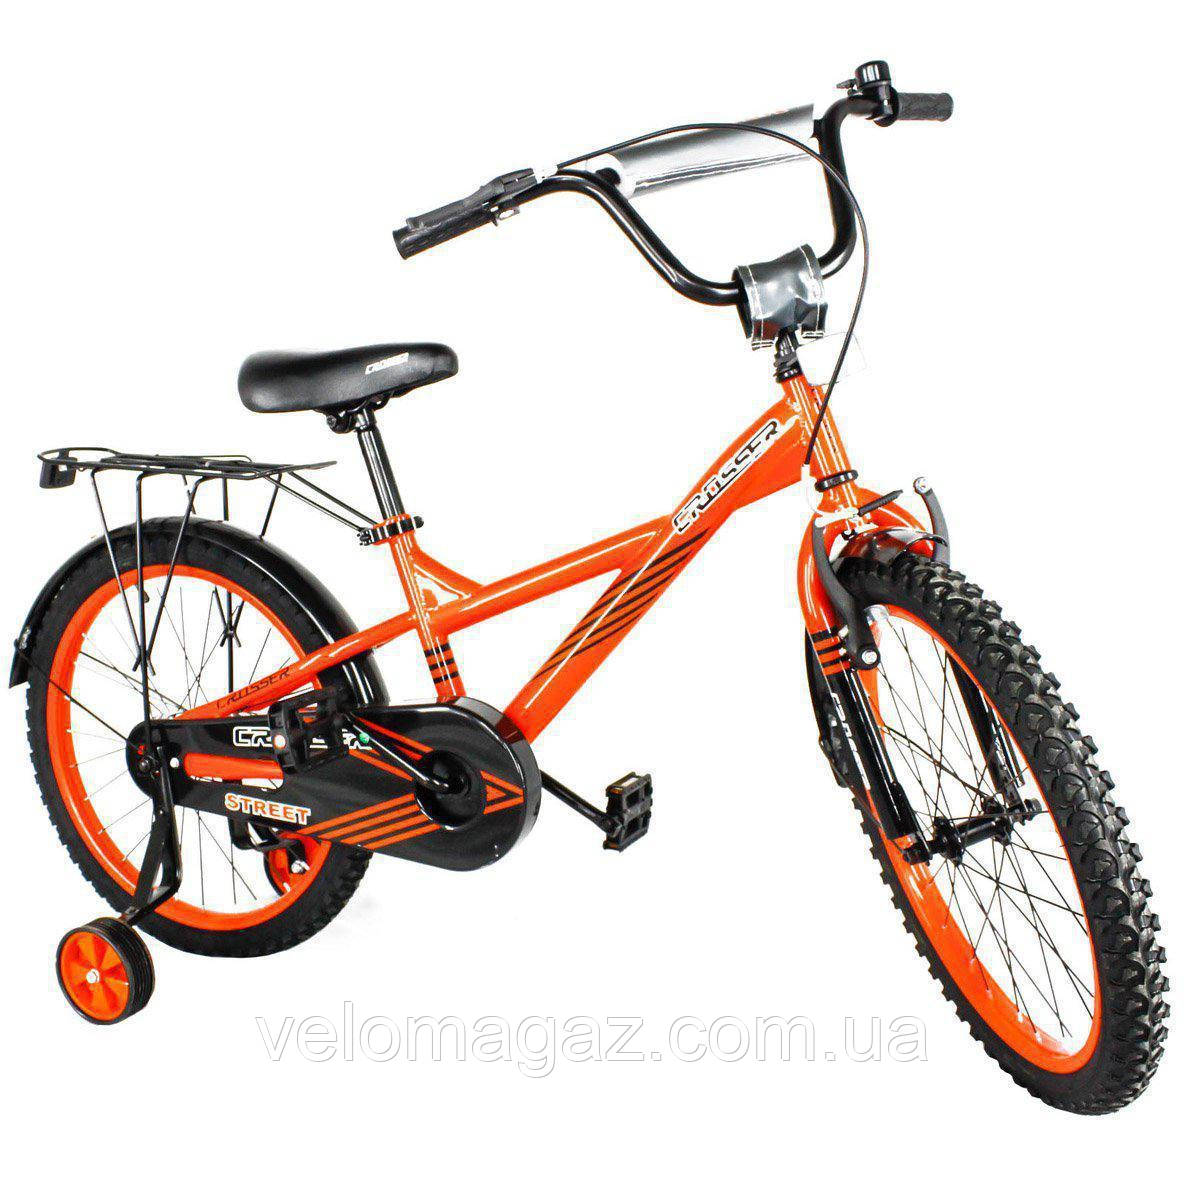 STREET CROSSER-7 16 детский велосипед